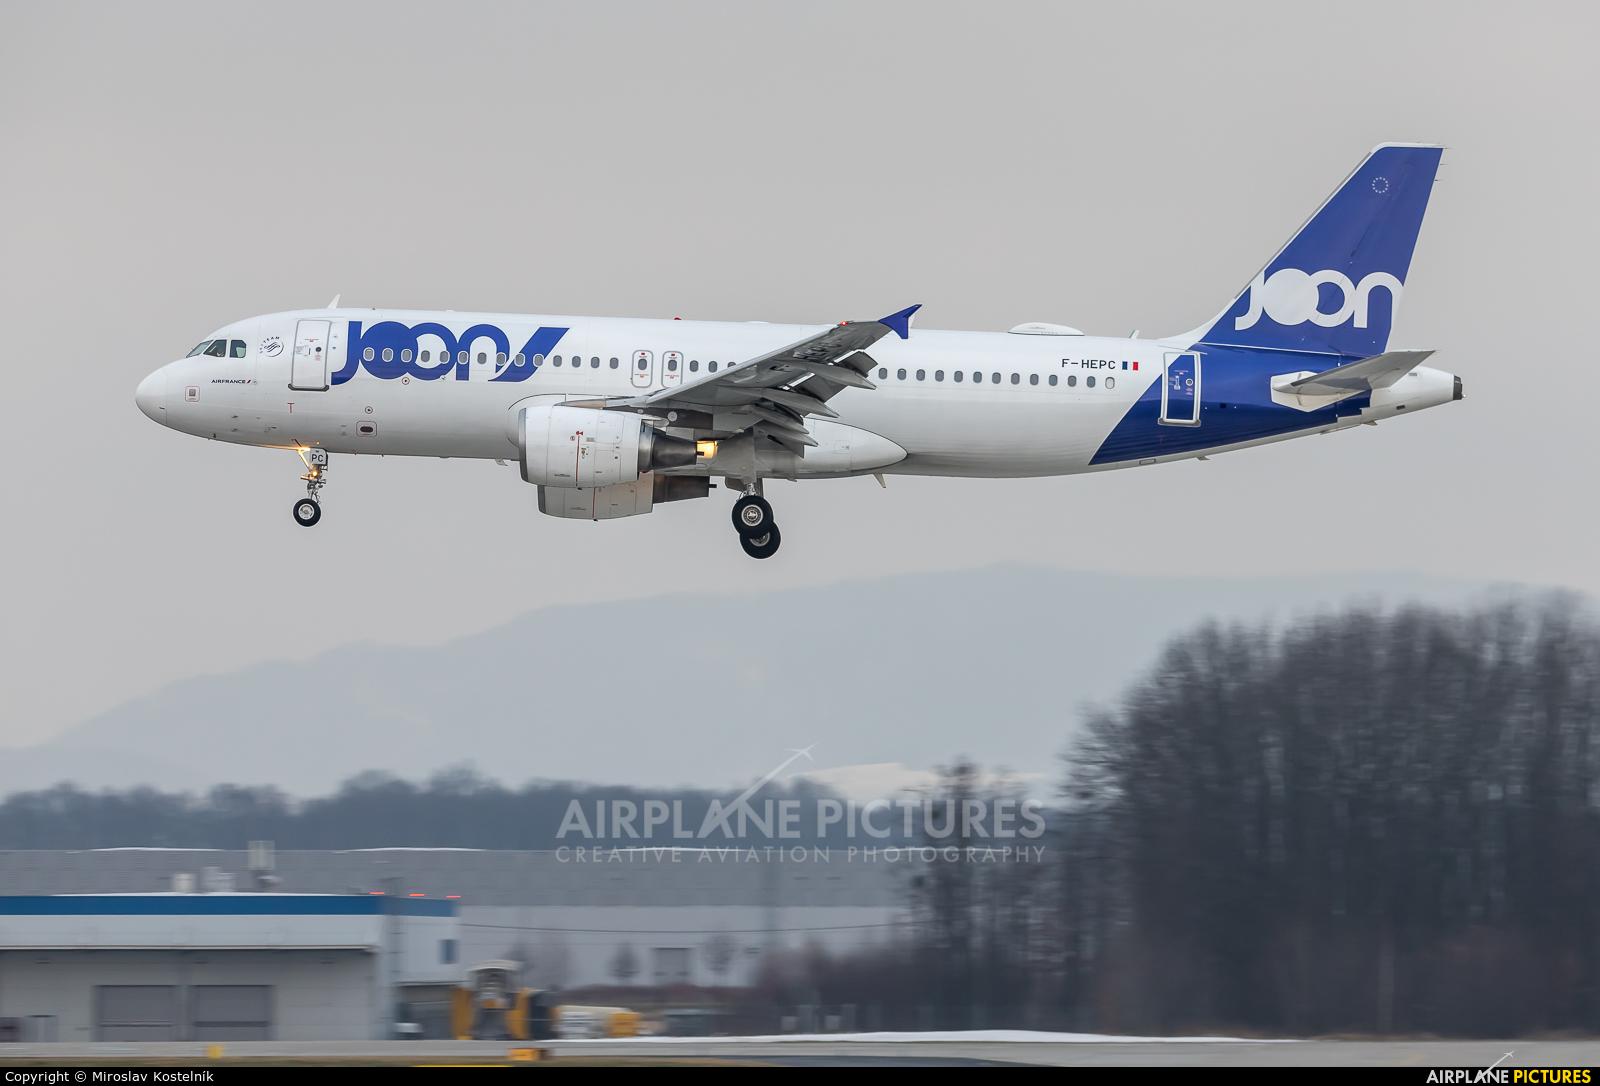 Air France F-HEPC aircraft at Ostrava Mošnov